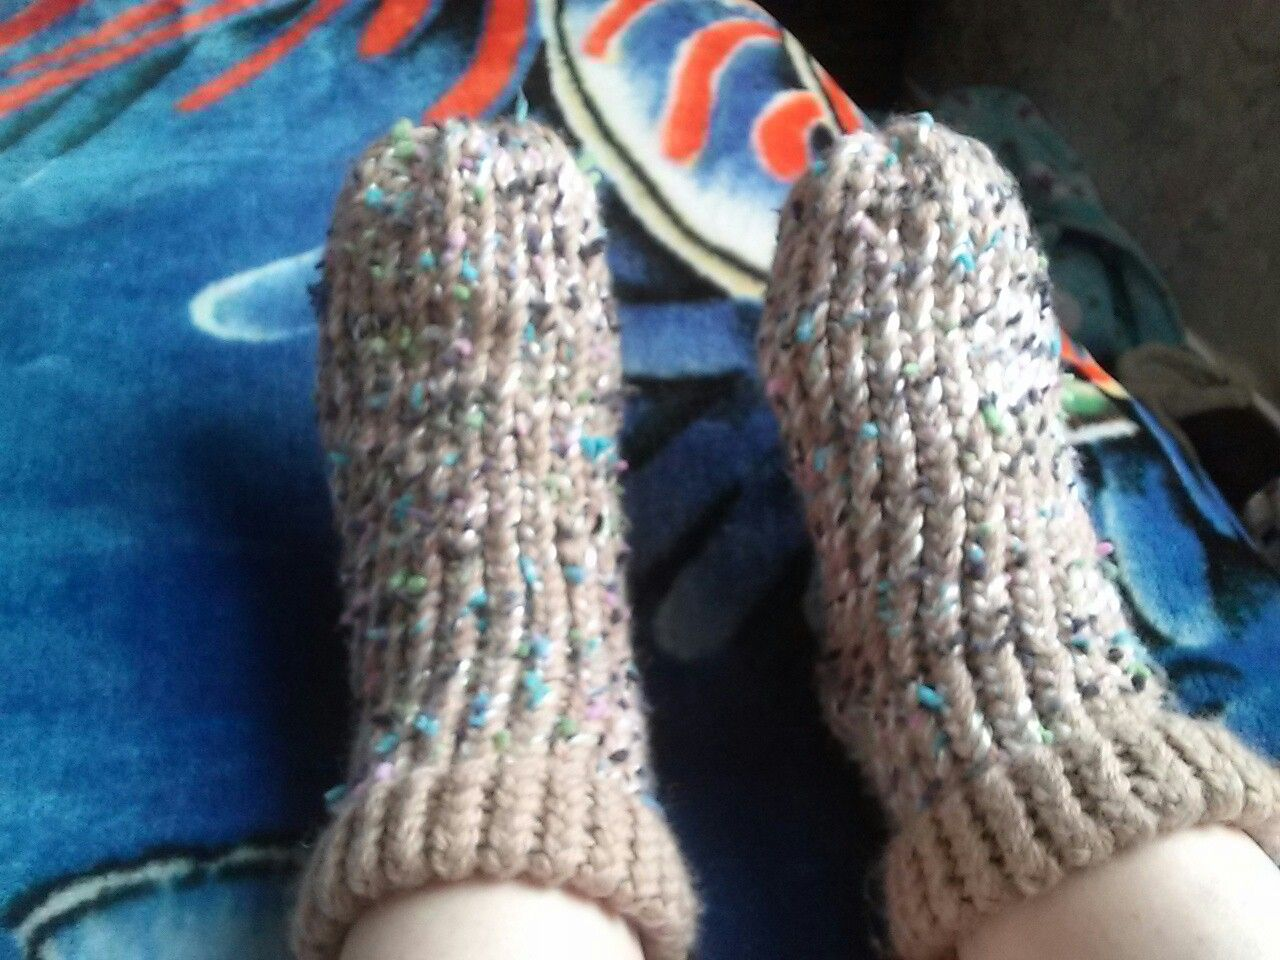 Loom knit on blue knifty knitter. Slipper socks.toasty toes ☺ Easy ...